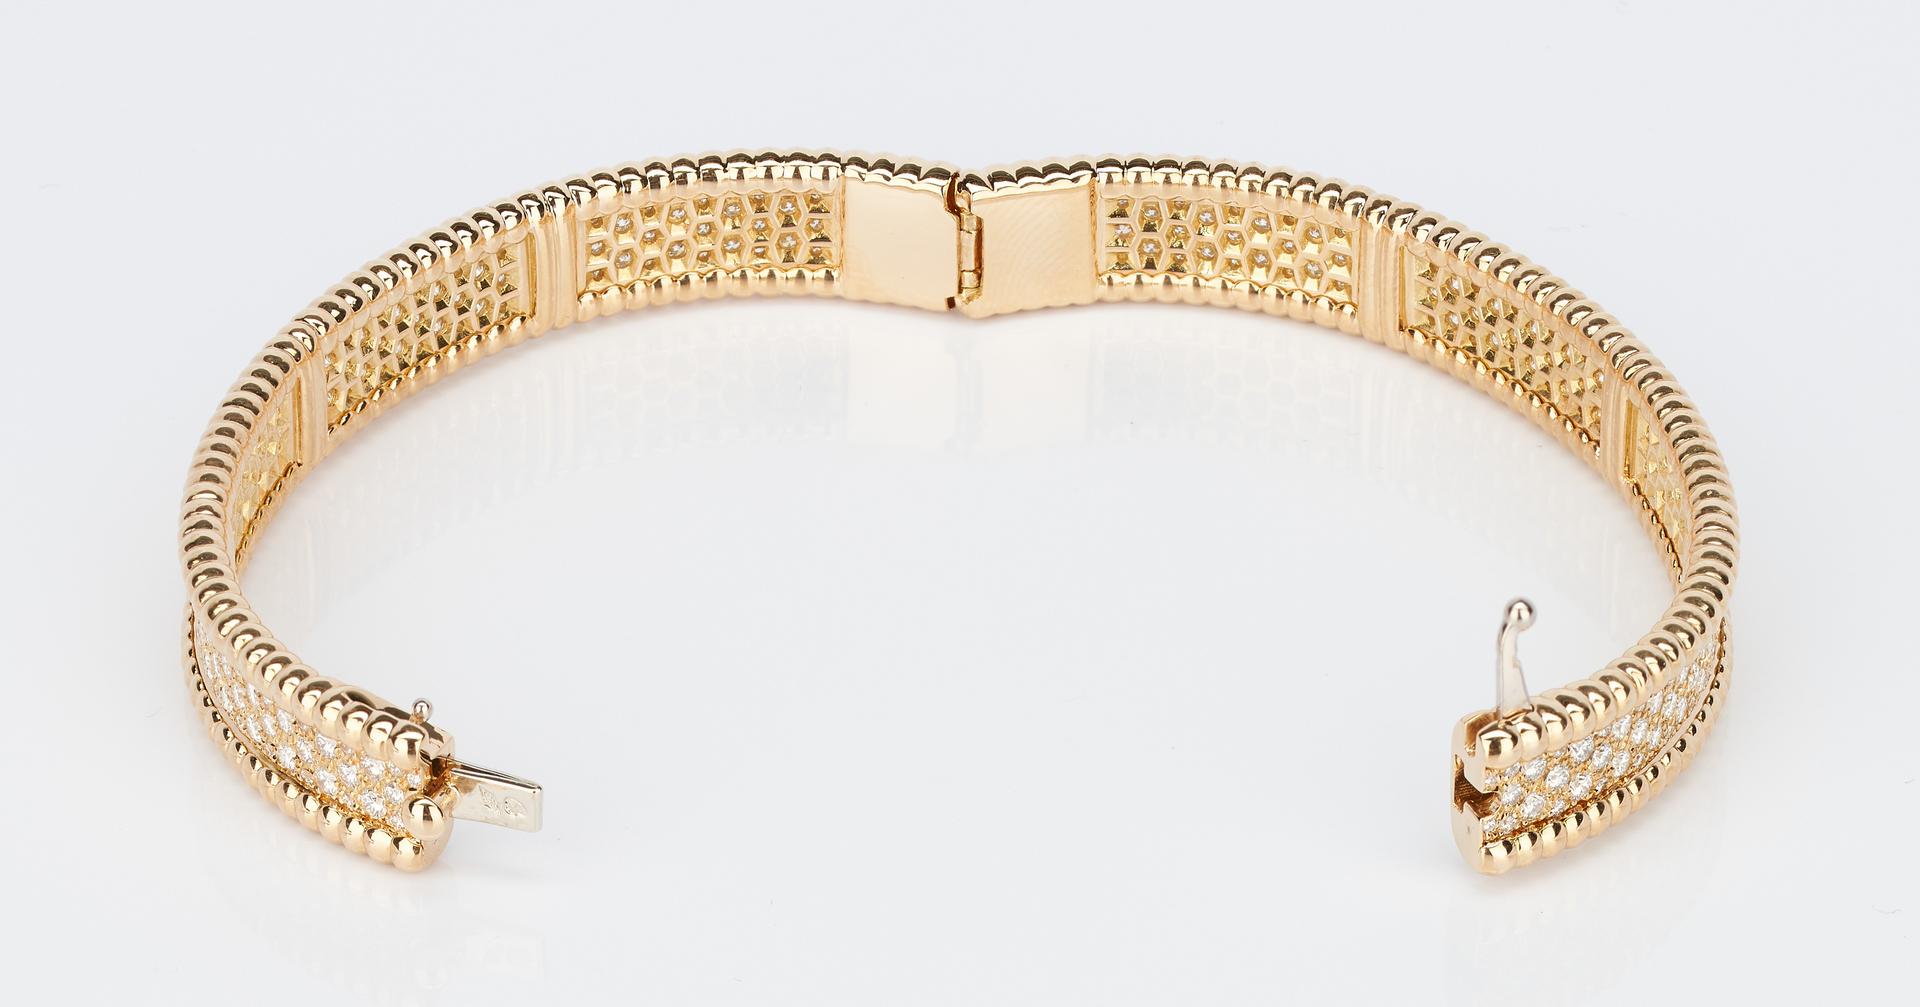 Lot 217: Ladies 18K Van Cleef & Arpels Bracelet w/ Diamonds